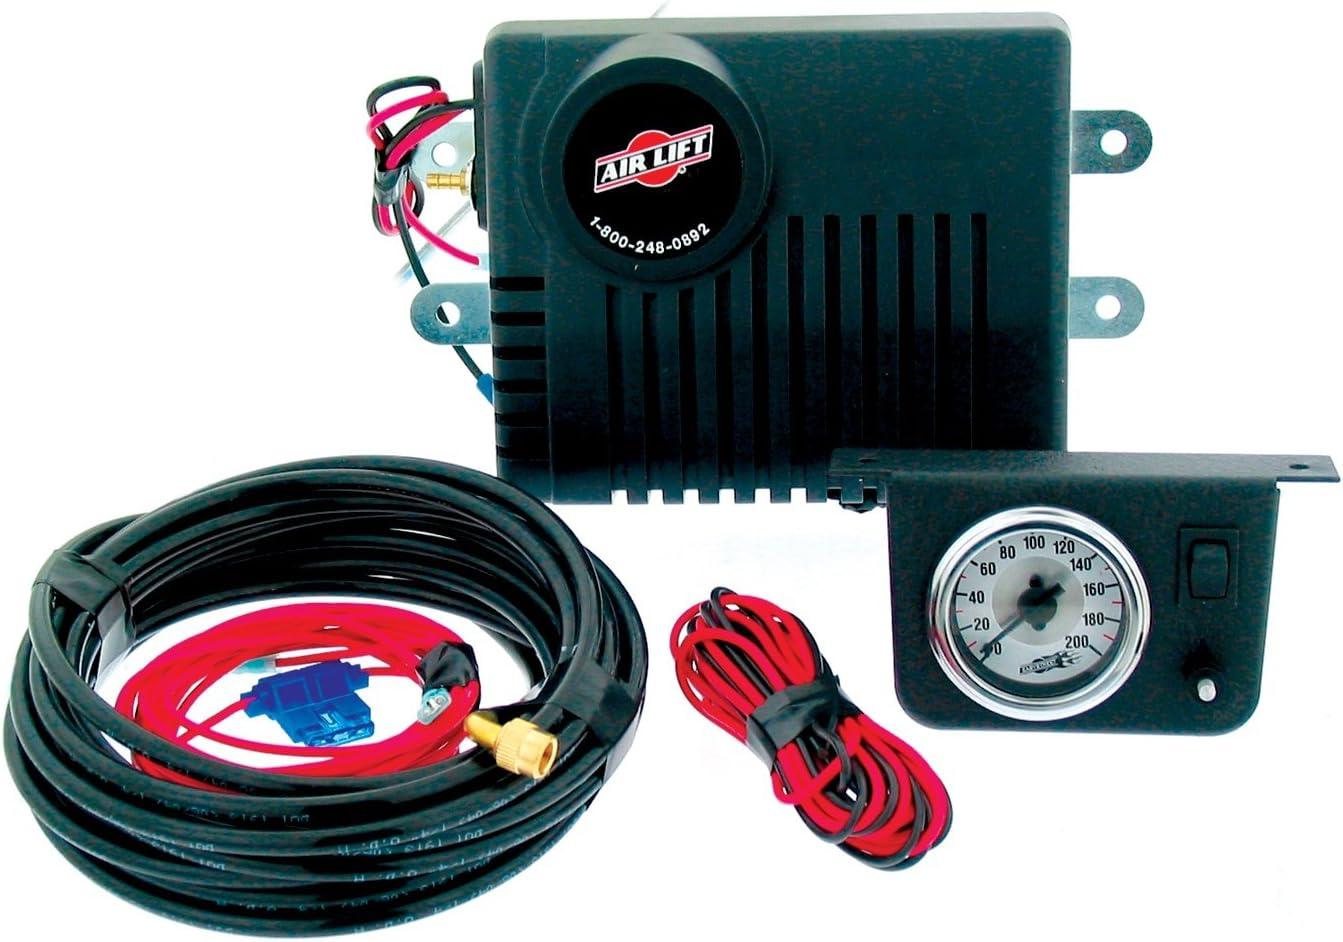 jeep air suspension wiring harness diagram amazon com air lift 25804 air shock controller kit automotive  air lift 25804 air shock controller kit